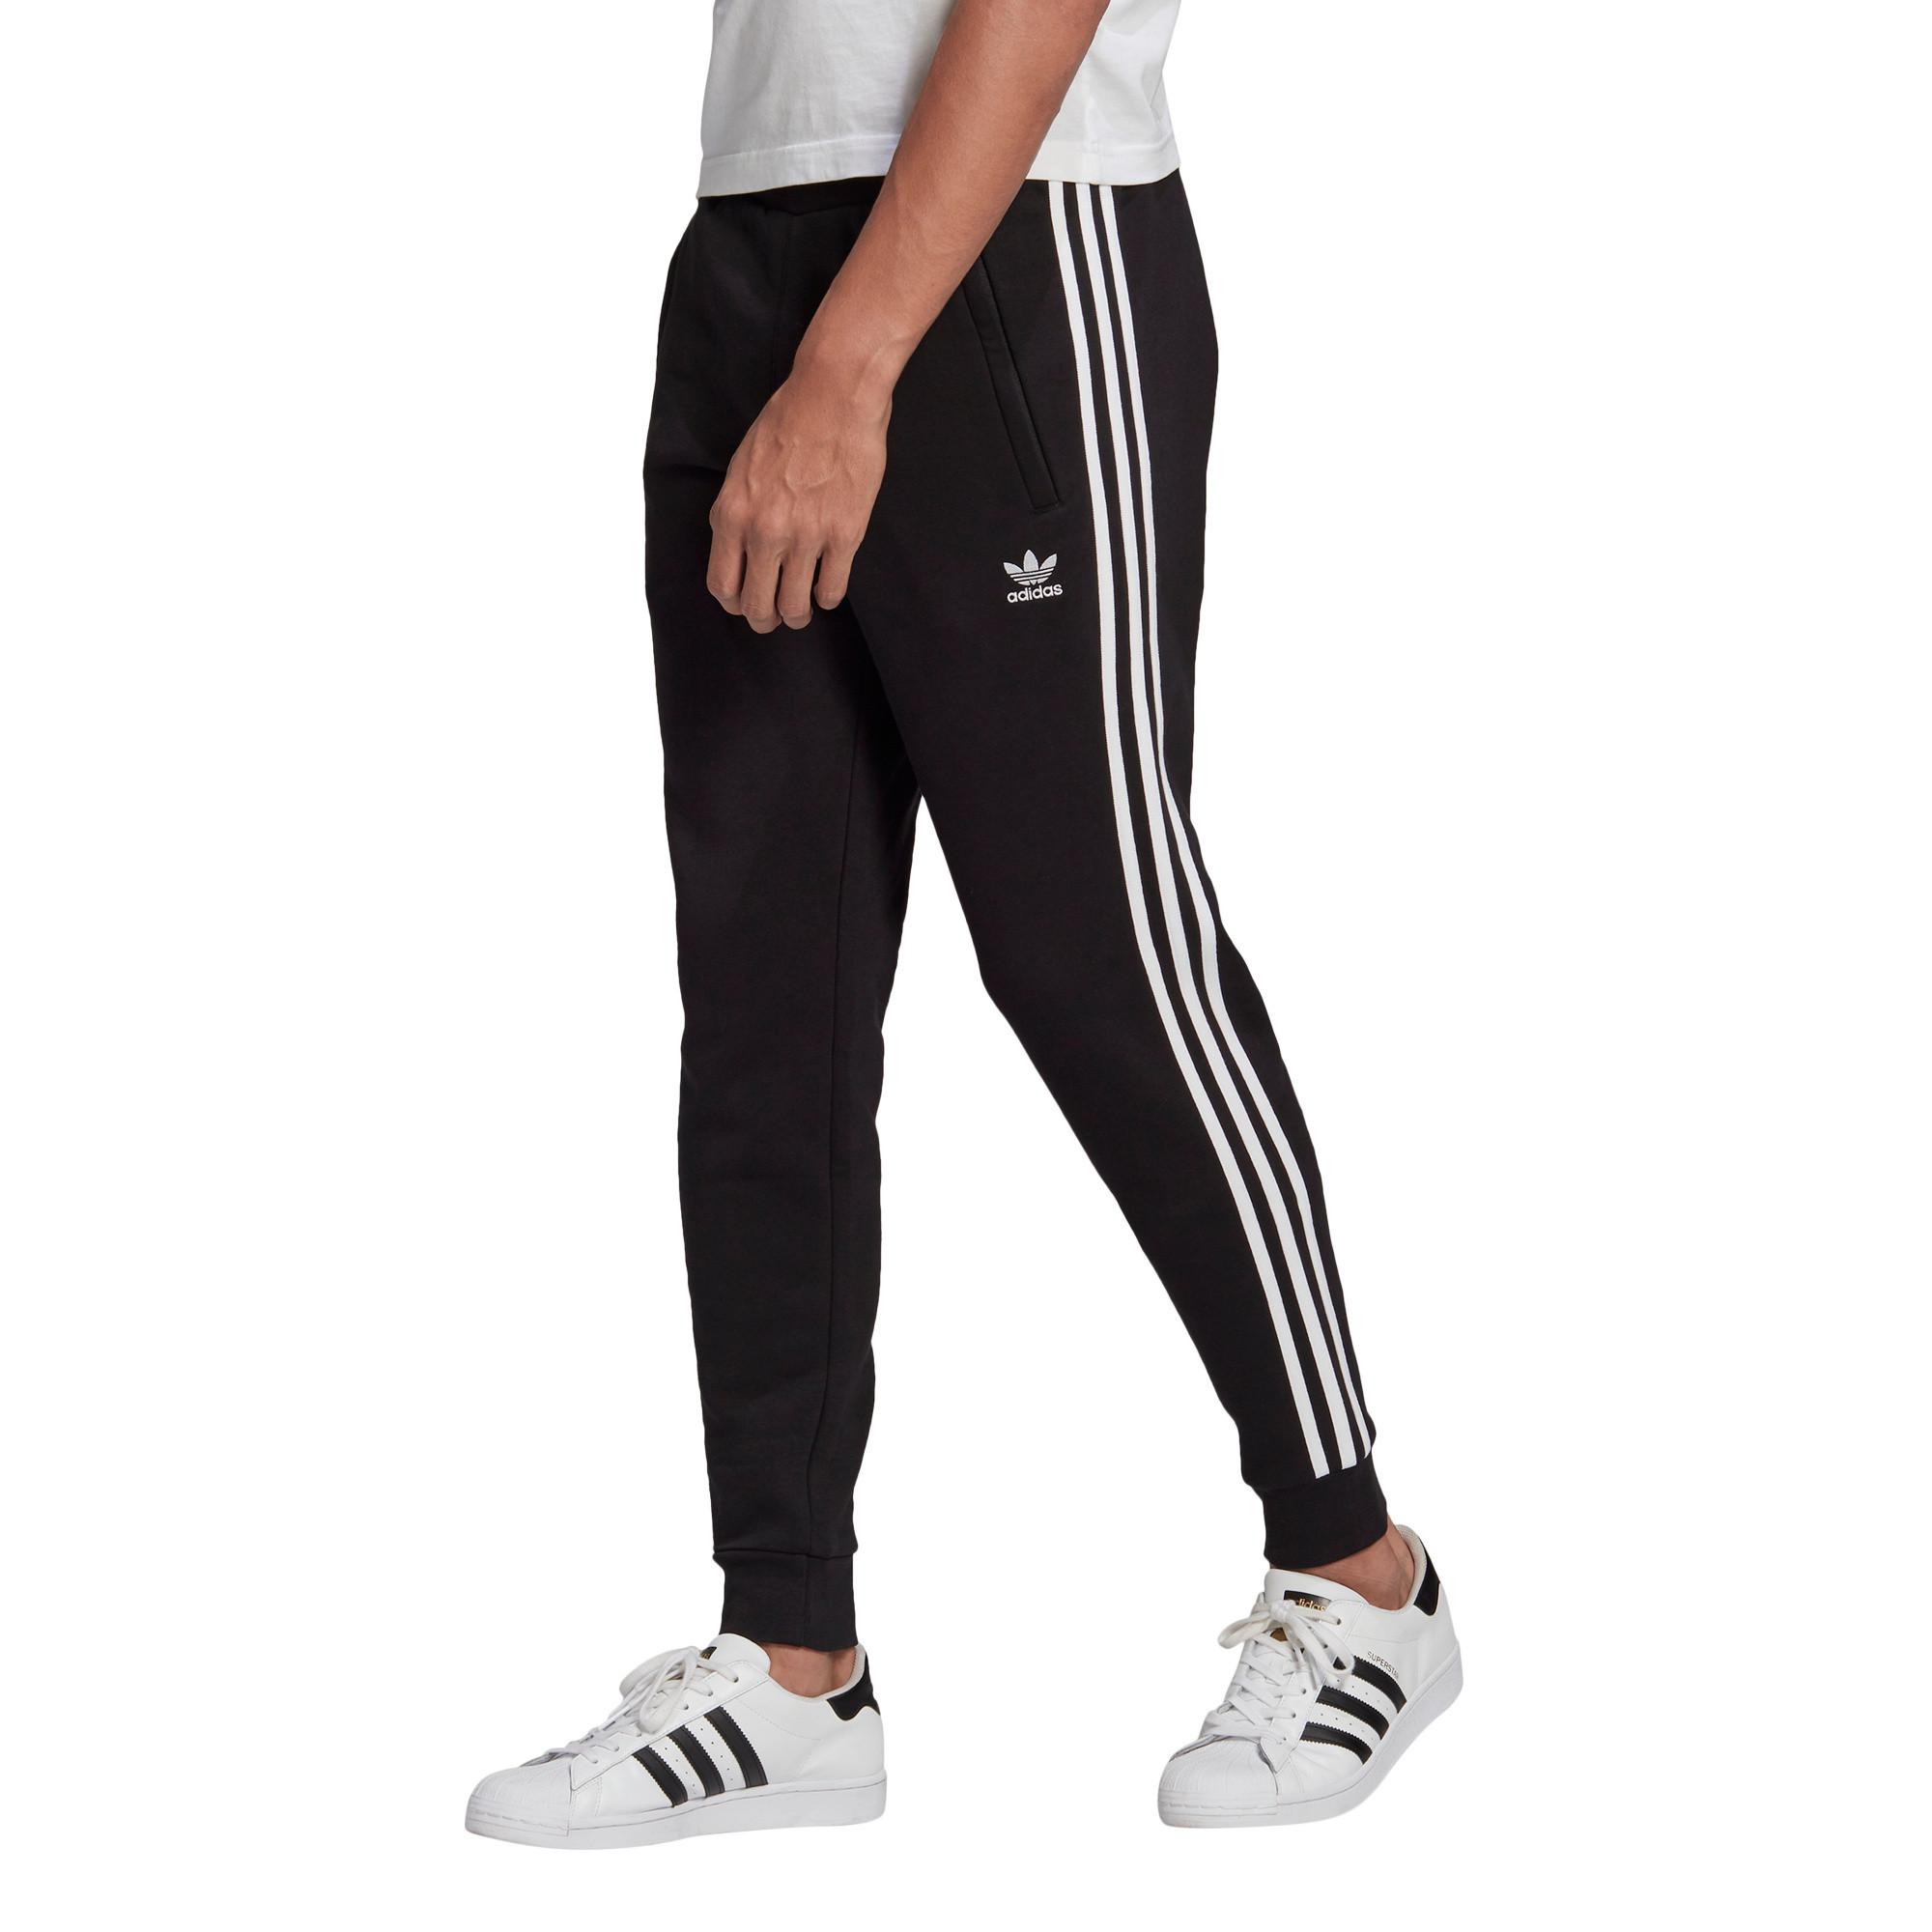 Pantaloni uomo adicolor Classics 3-Stripes, Nero, large image number 3